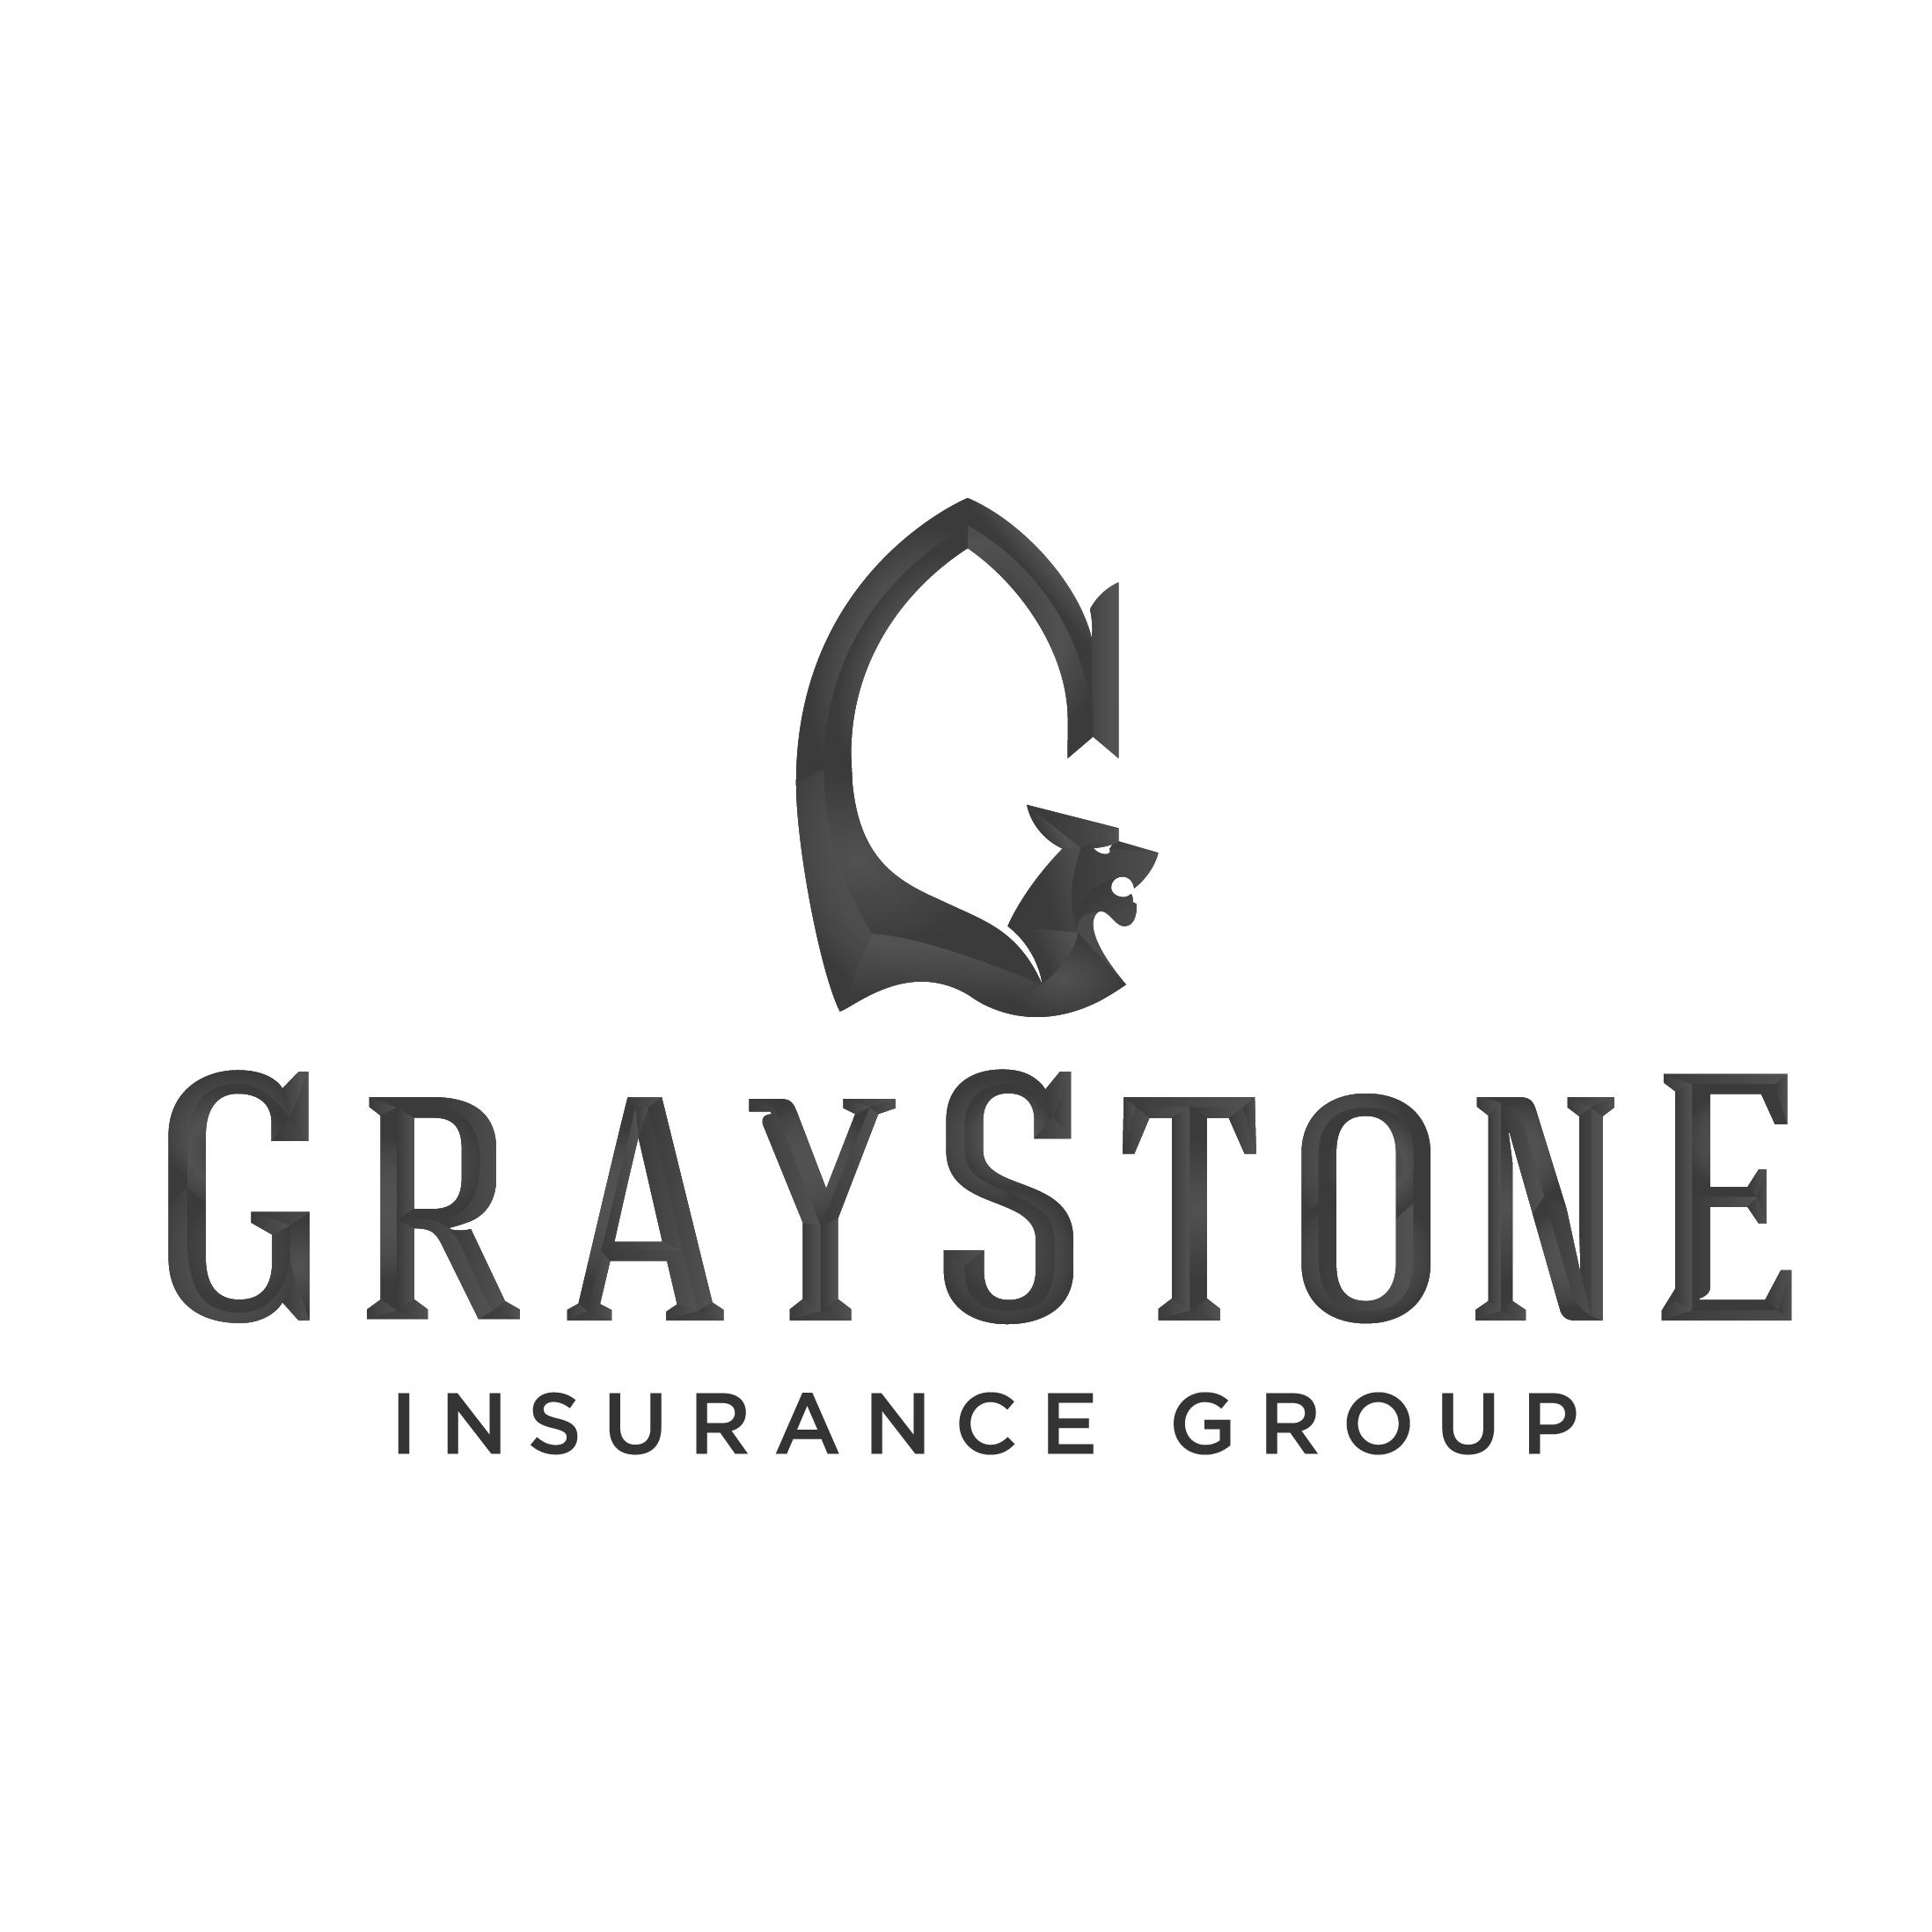 GrayStone Insurance Group